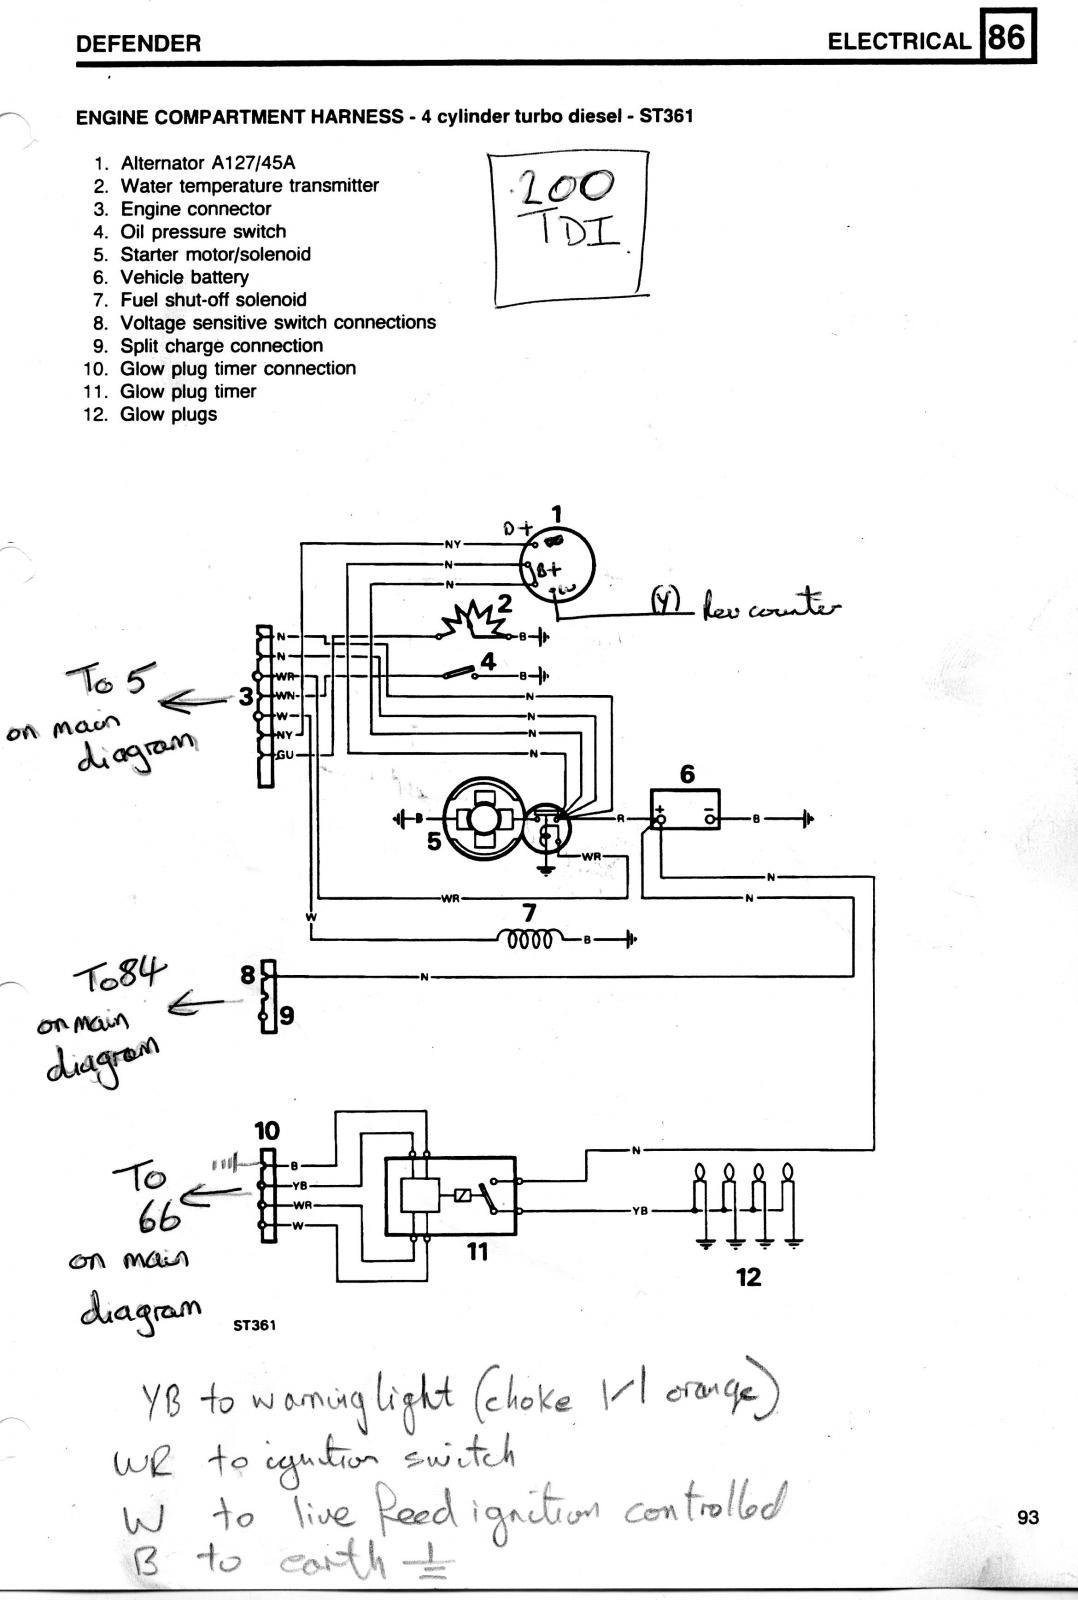 99 f350 glow plug wiring diagram